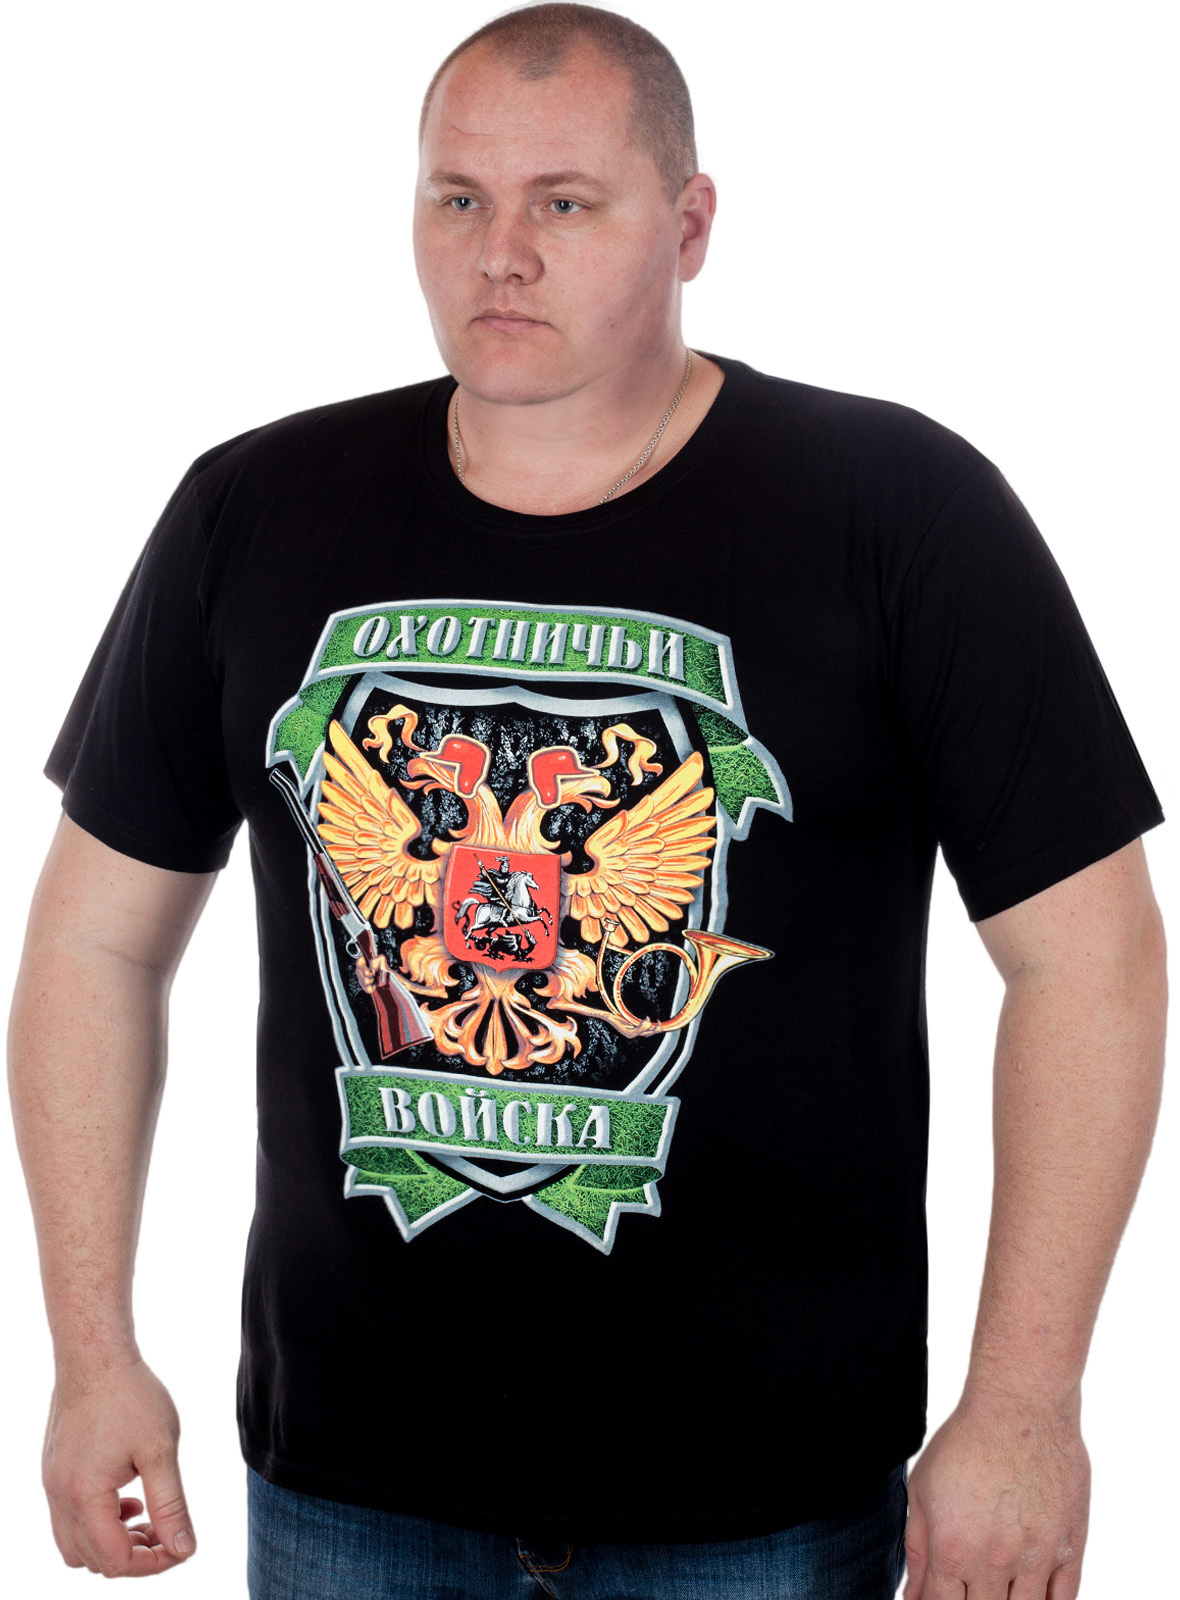 Купить футболку про охоту в интернет магазине Военпро